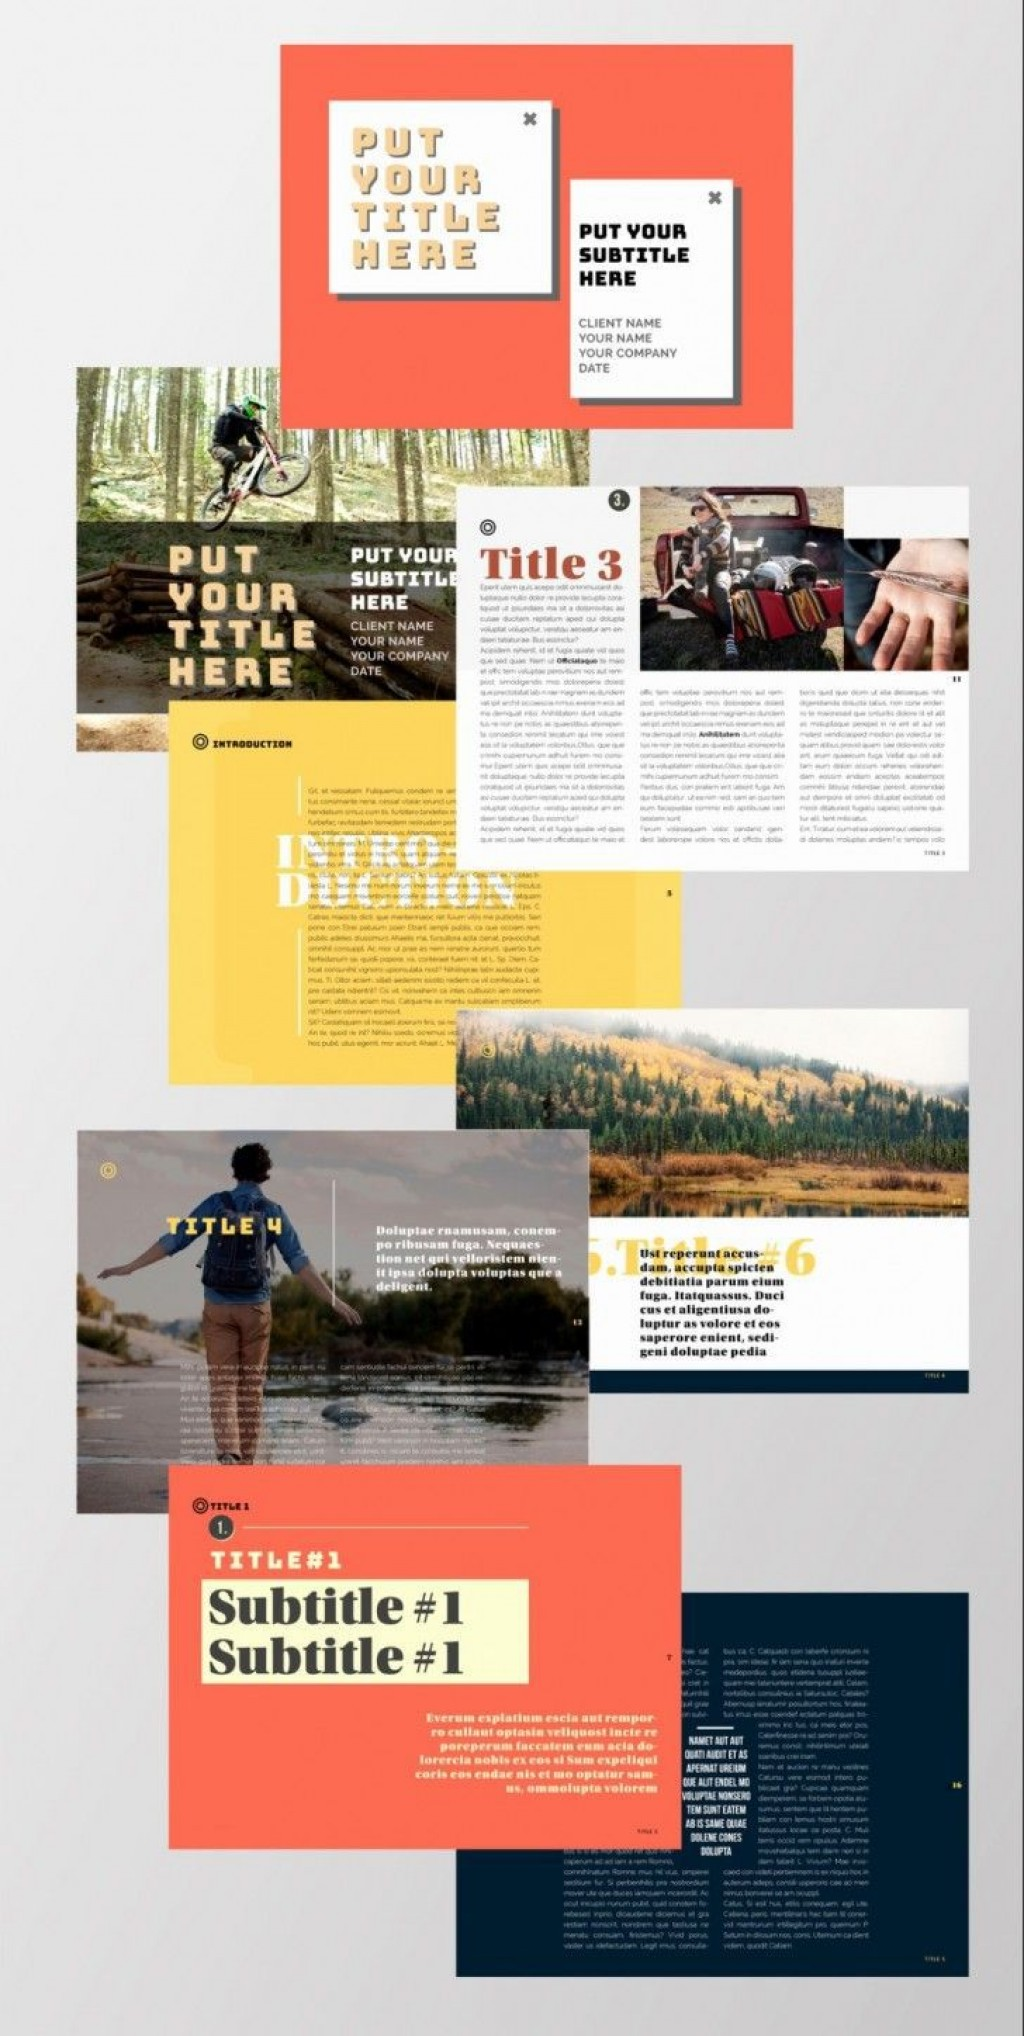 000 Amazing Magazine Template For Microsoft Word Photo  Layout Design DownloadLarge